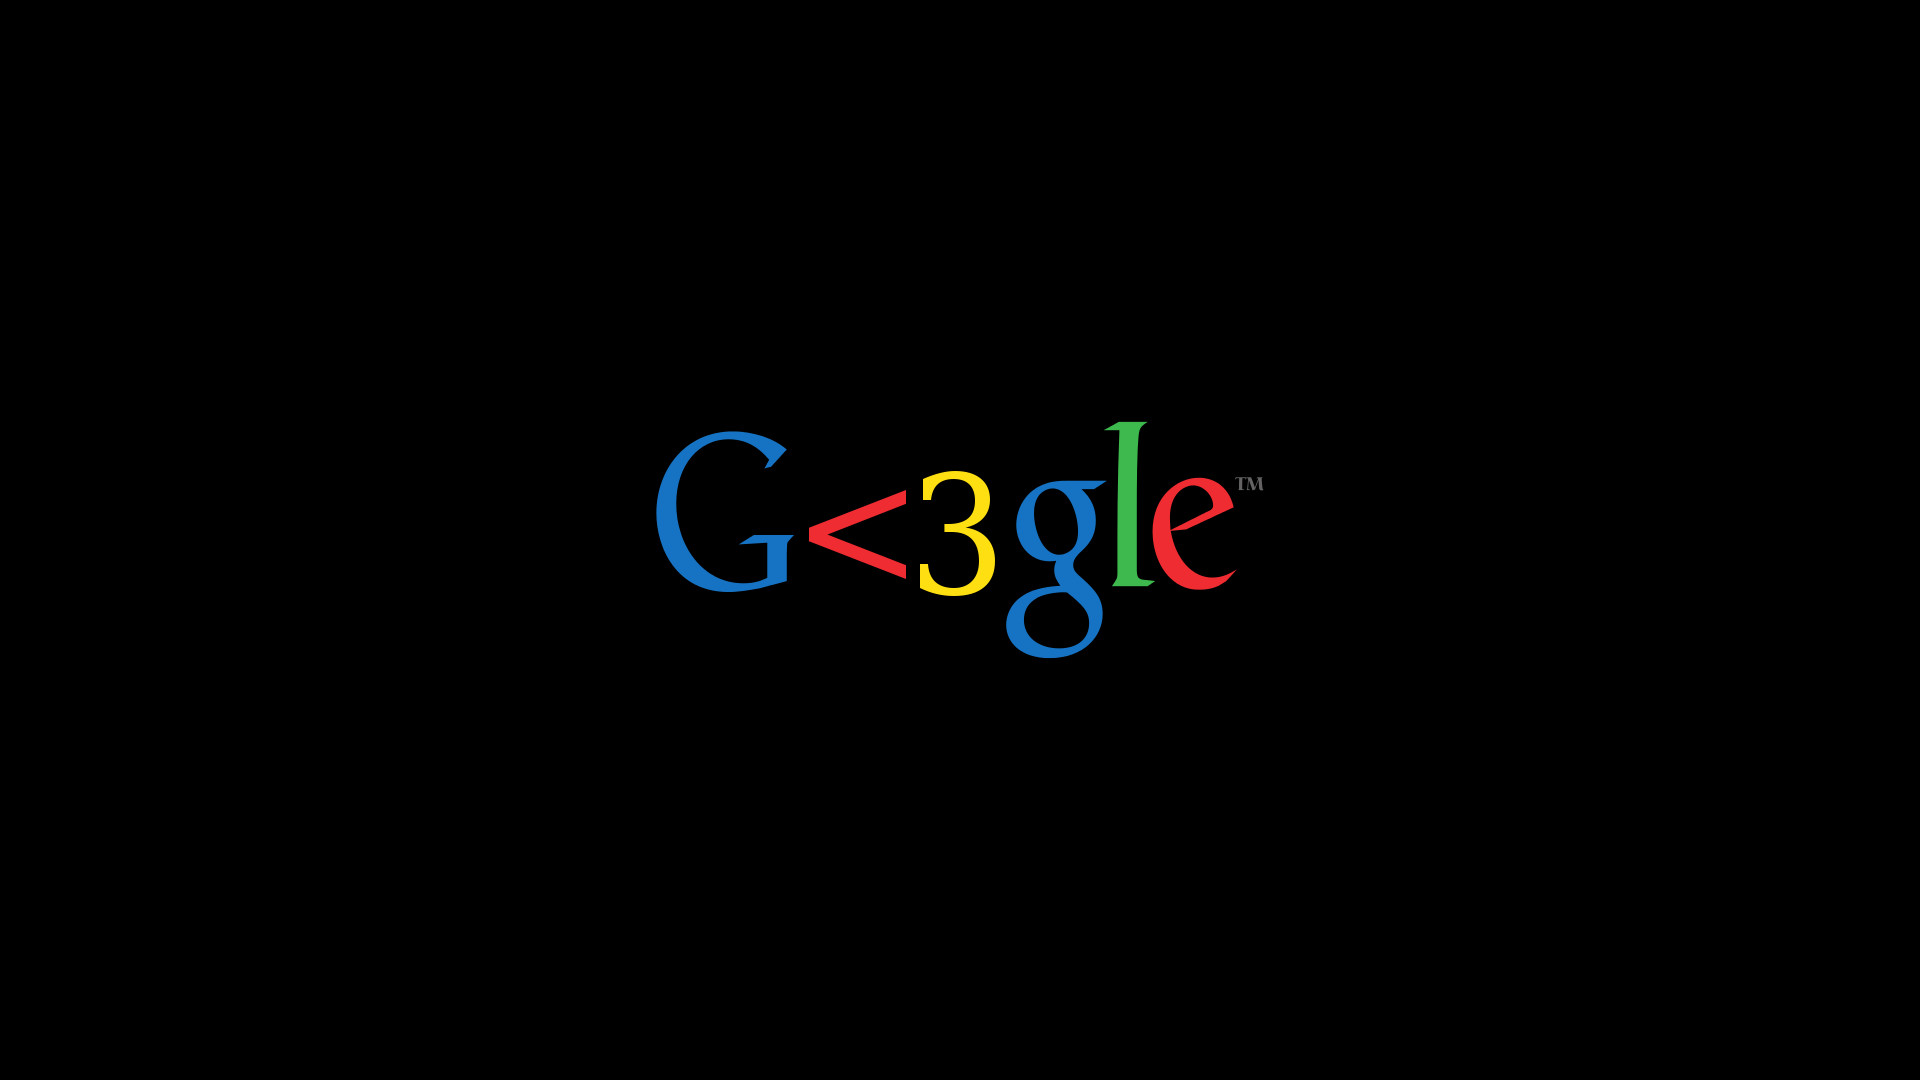 Google wallpapers HD download.